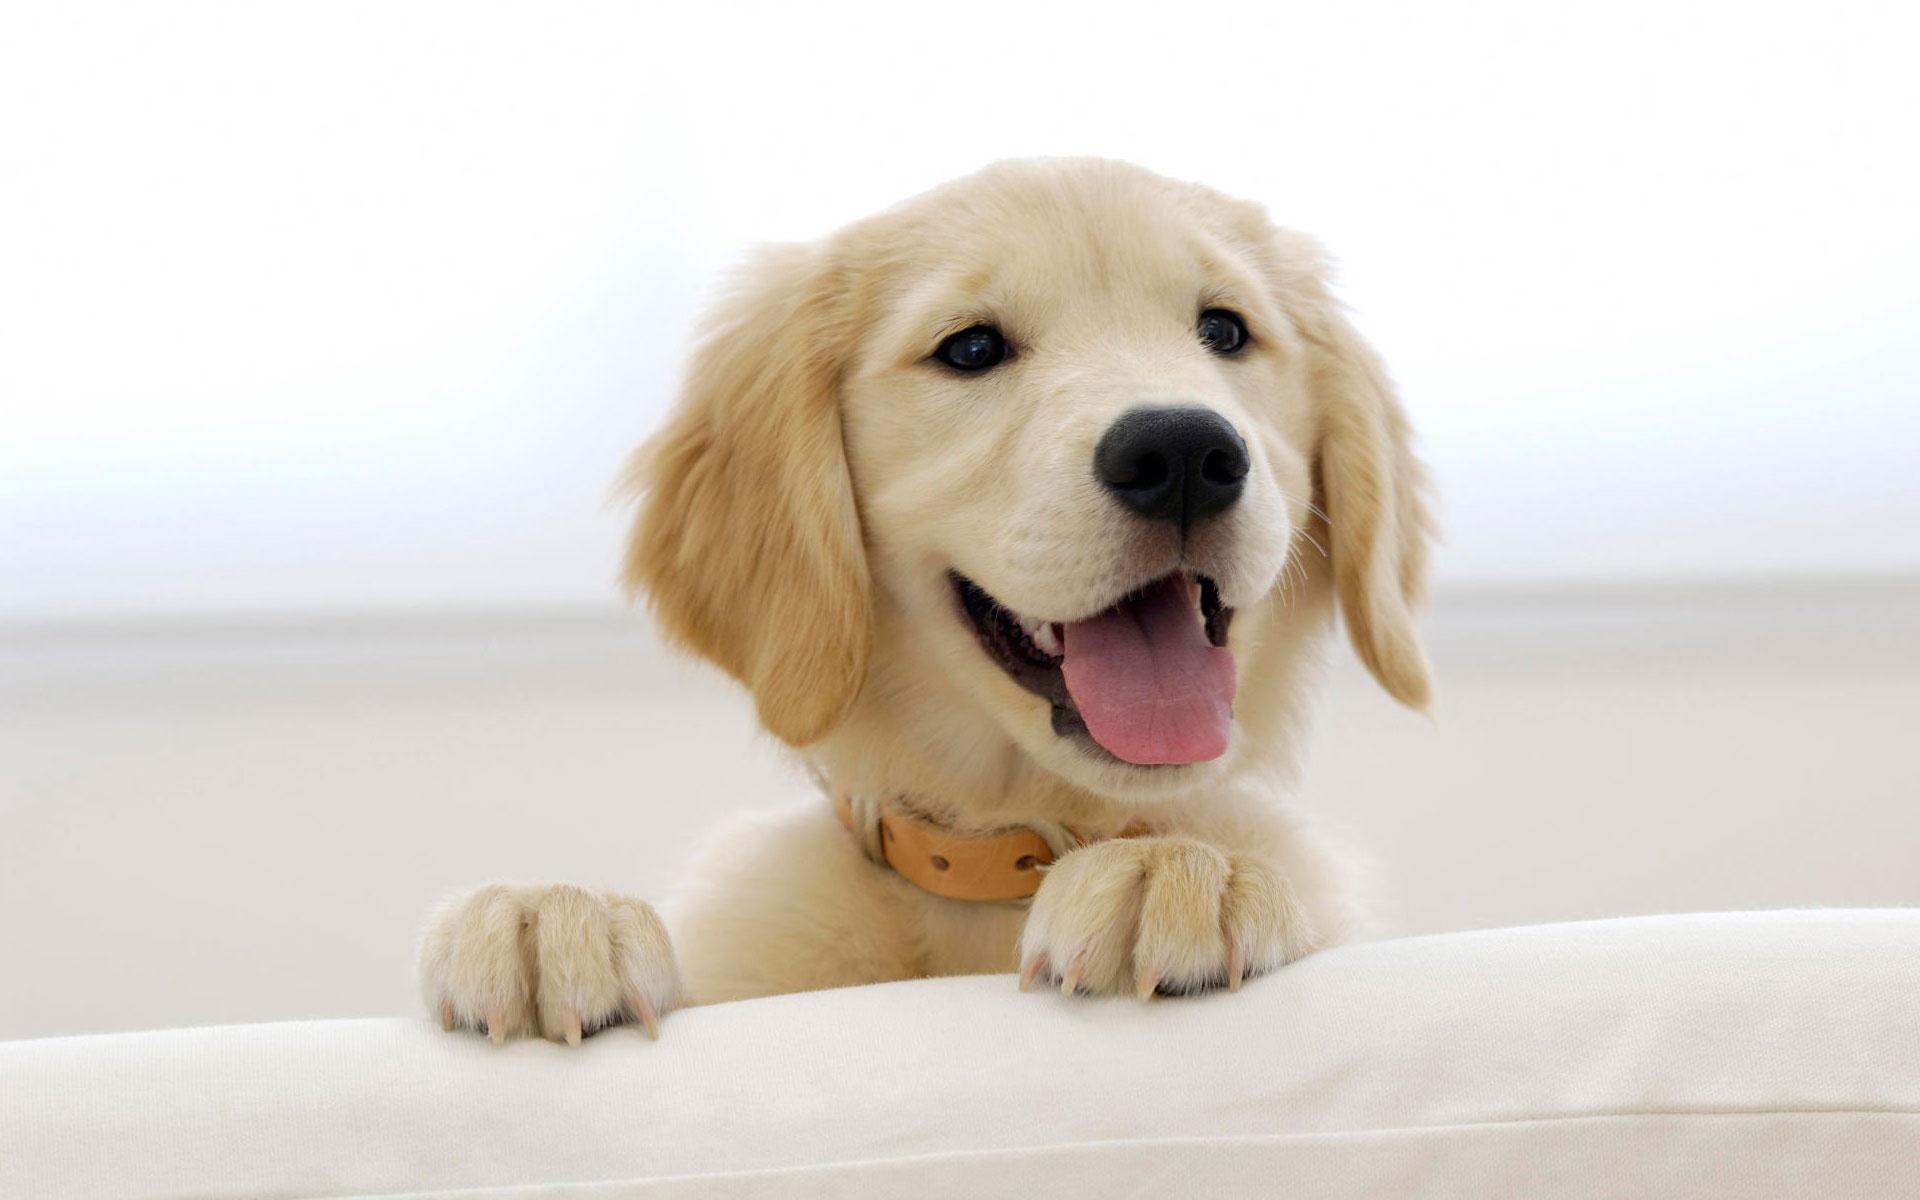 Free Golden Retriever Puppy phone wallpaper by 3176791458